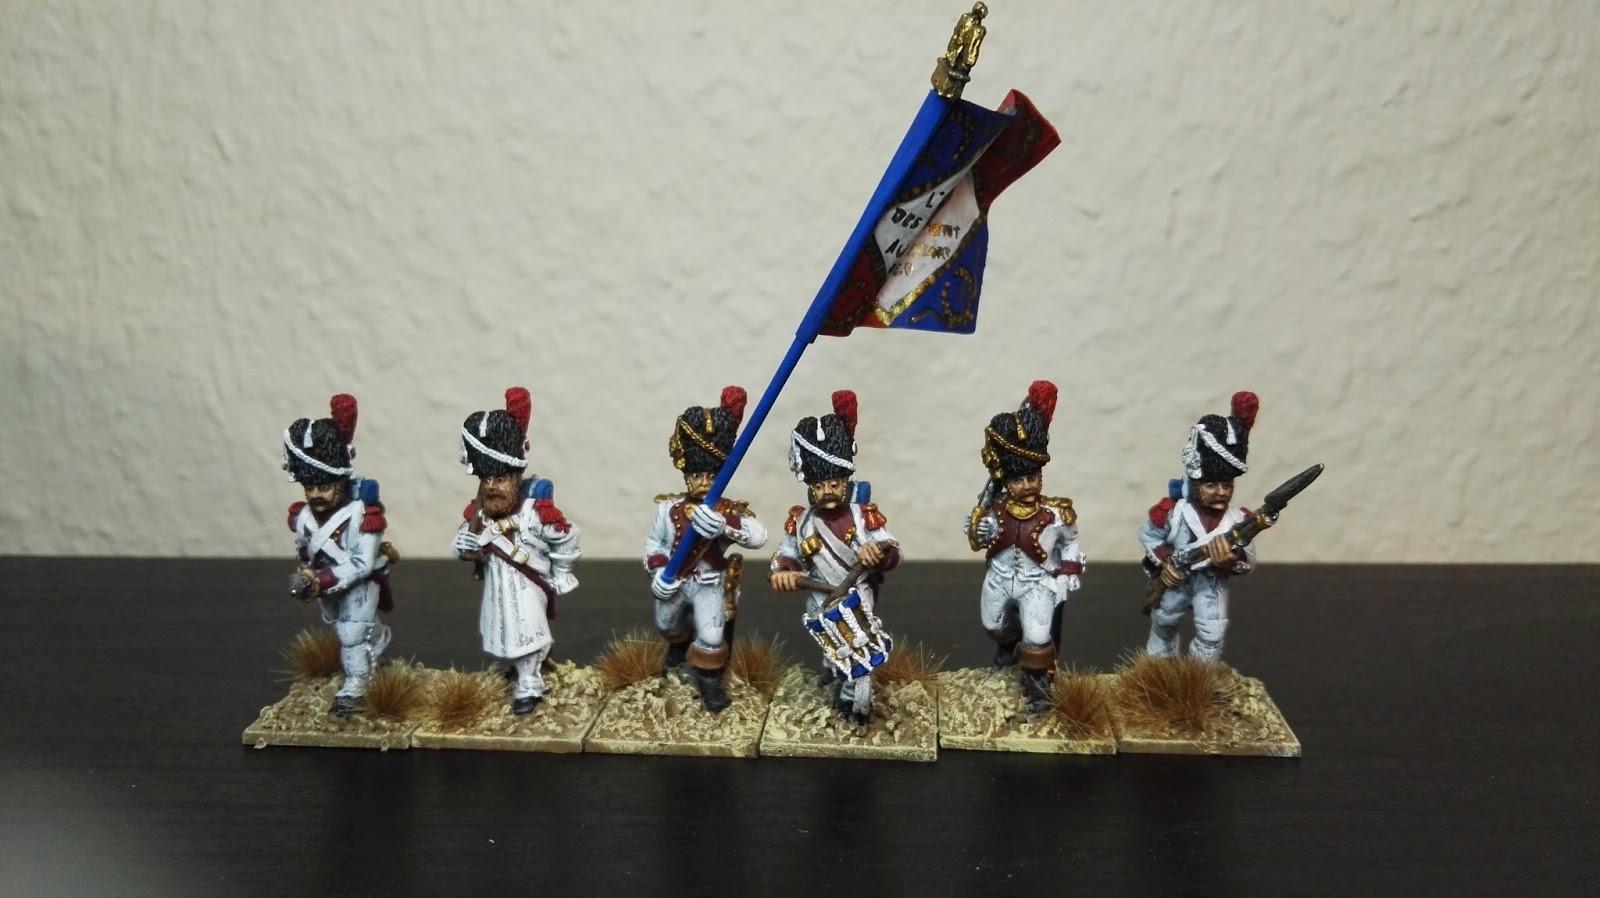 Grenadiers hollandais de la Garde impériale 3rd%2BDutch%2BGrenadier%2BRegiment%2B%25289%2529